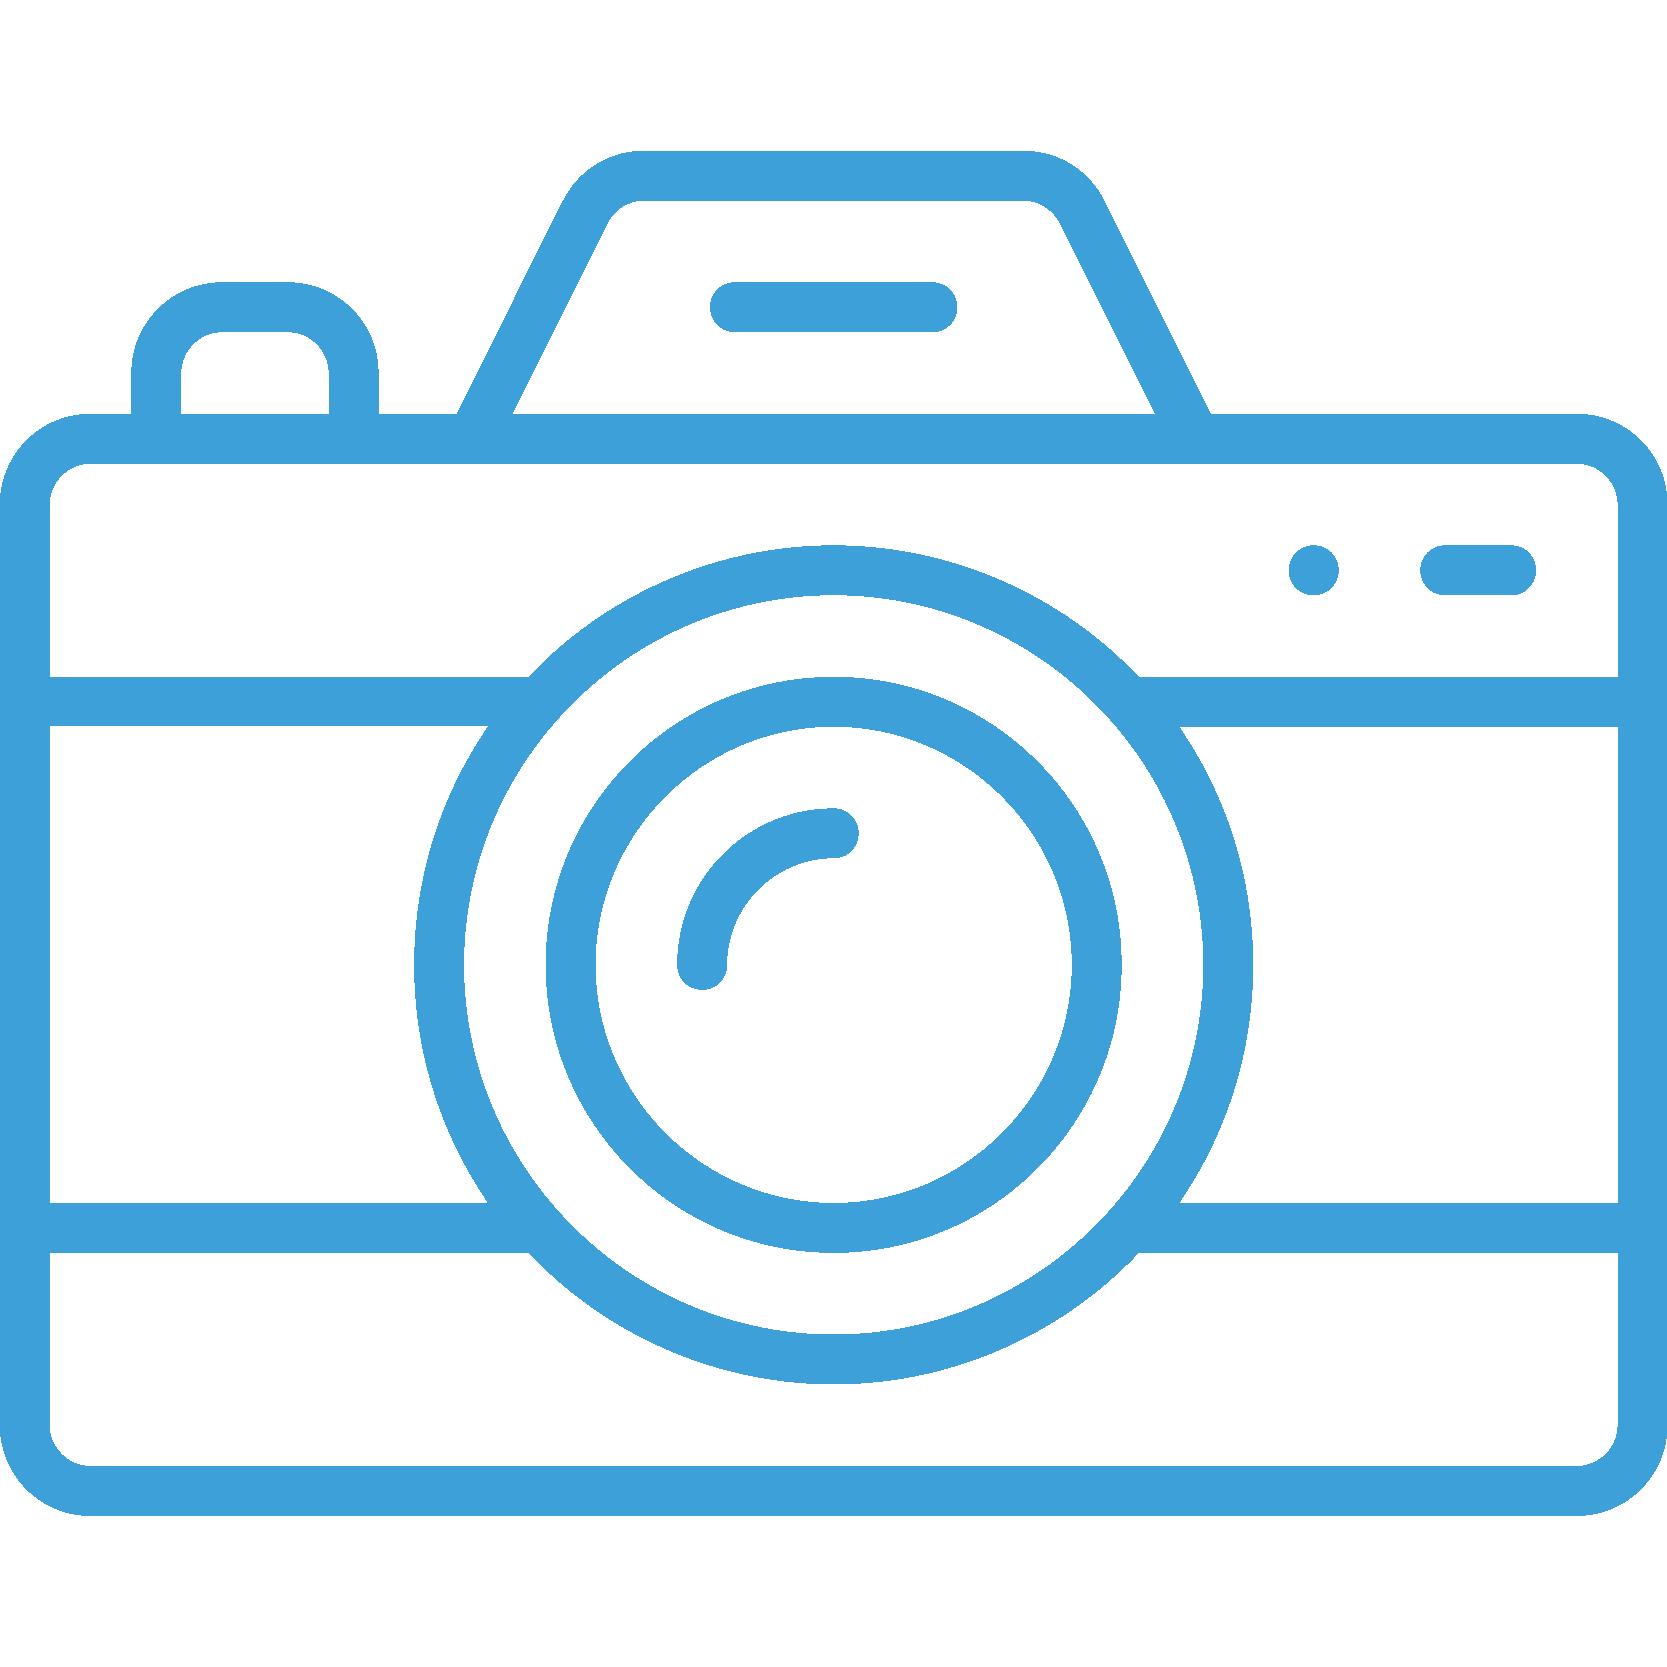 07_Photography_Icon-01